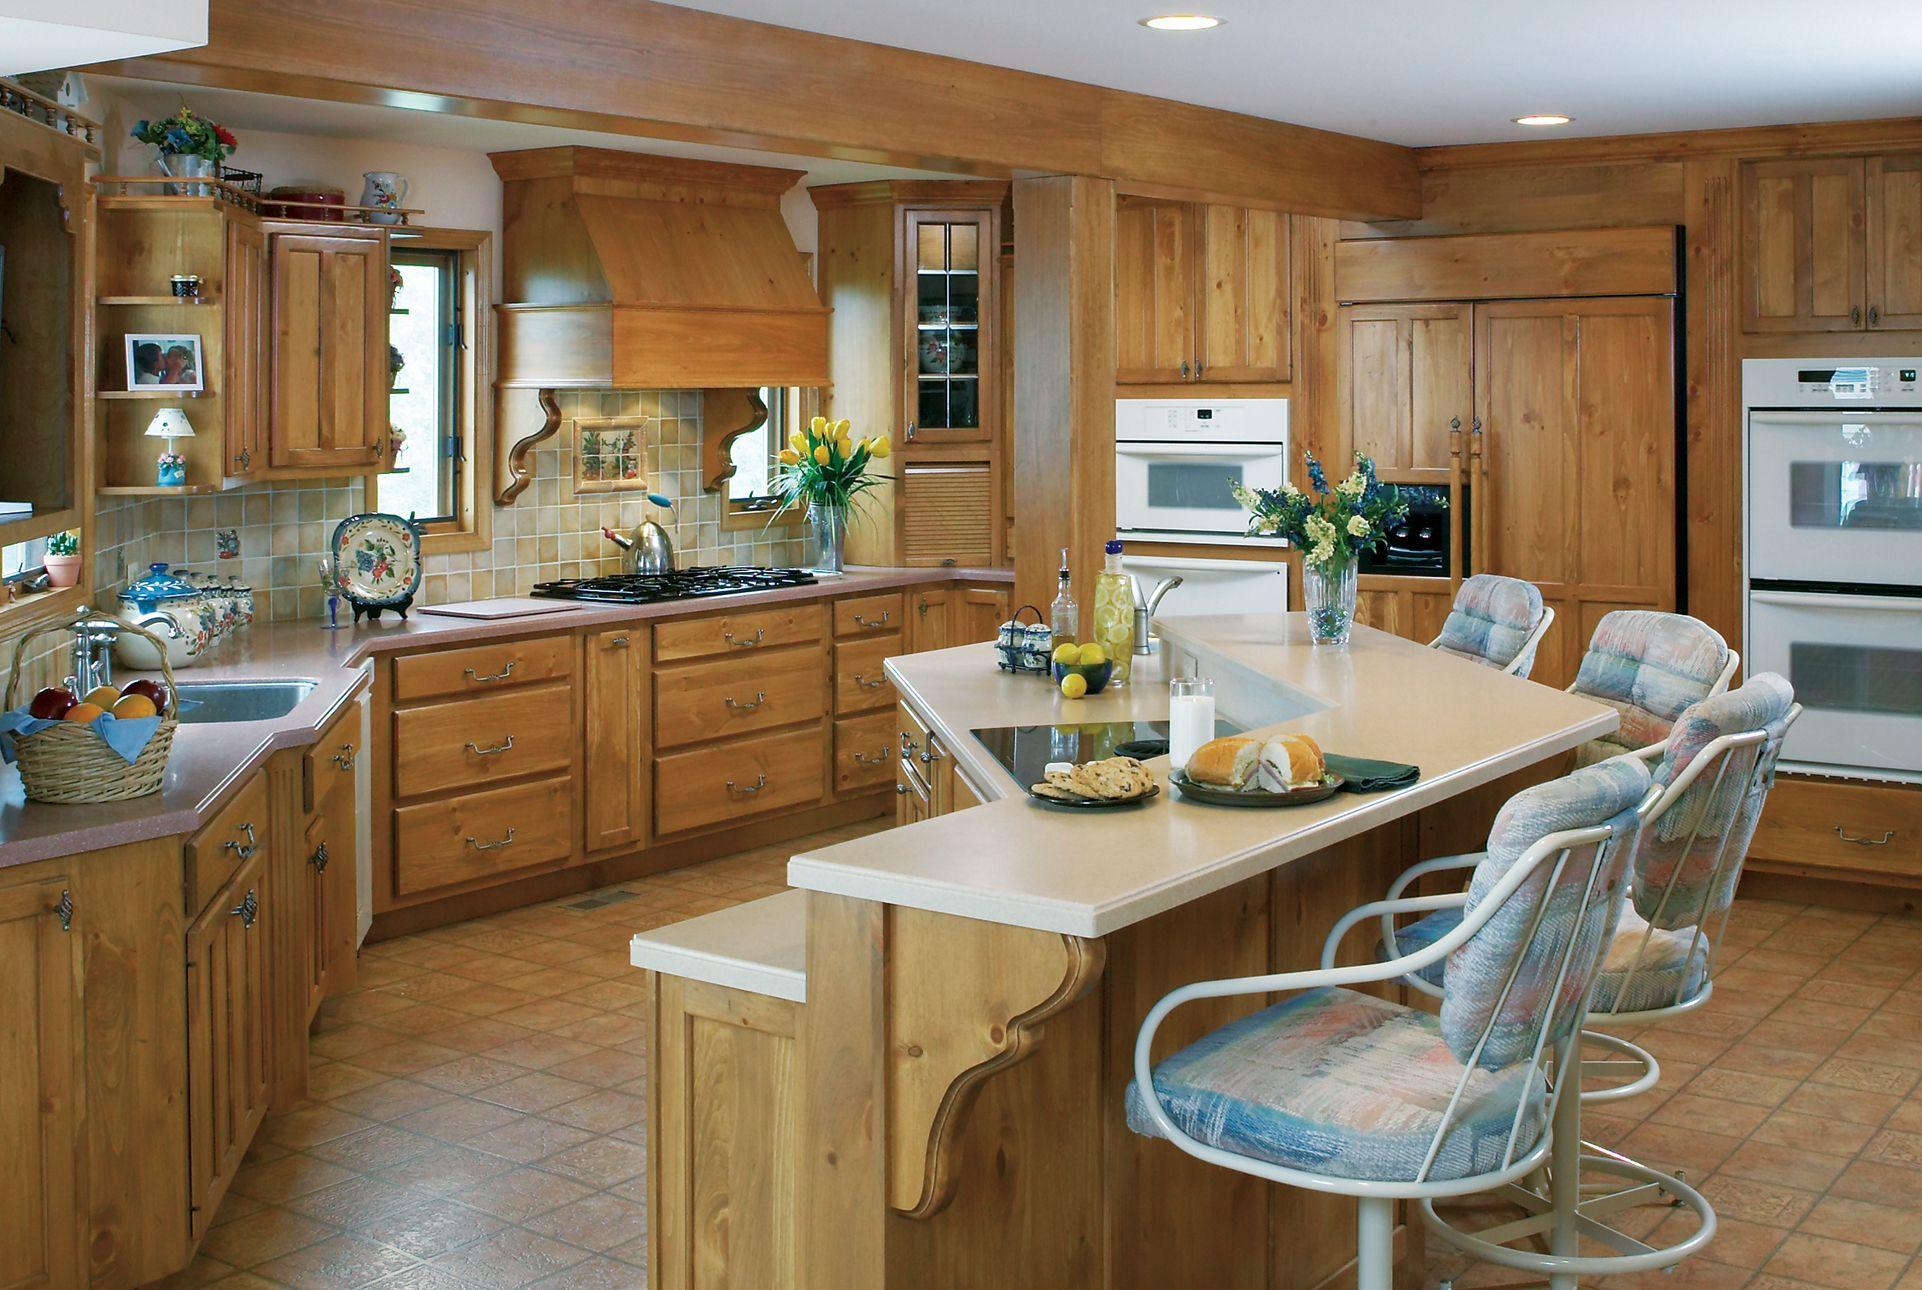 ^ 1000+ images about Designer Kitchens on Pinterest | Luxury kitchen ...